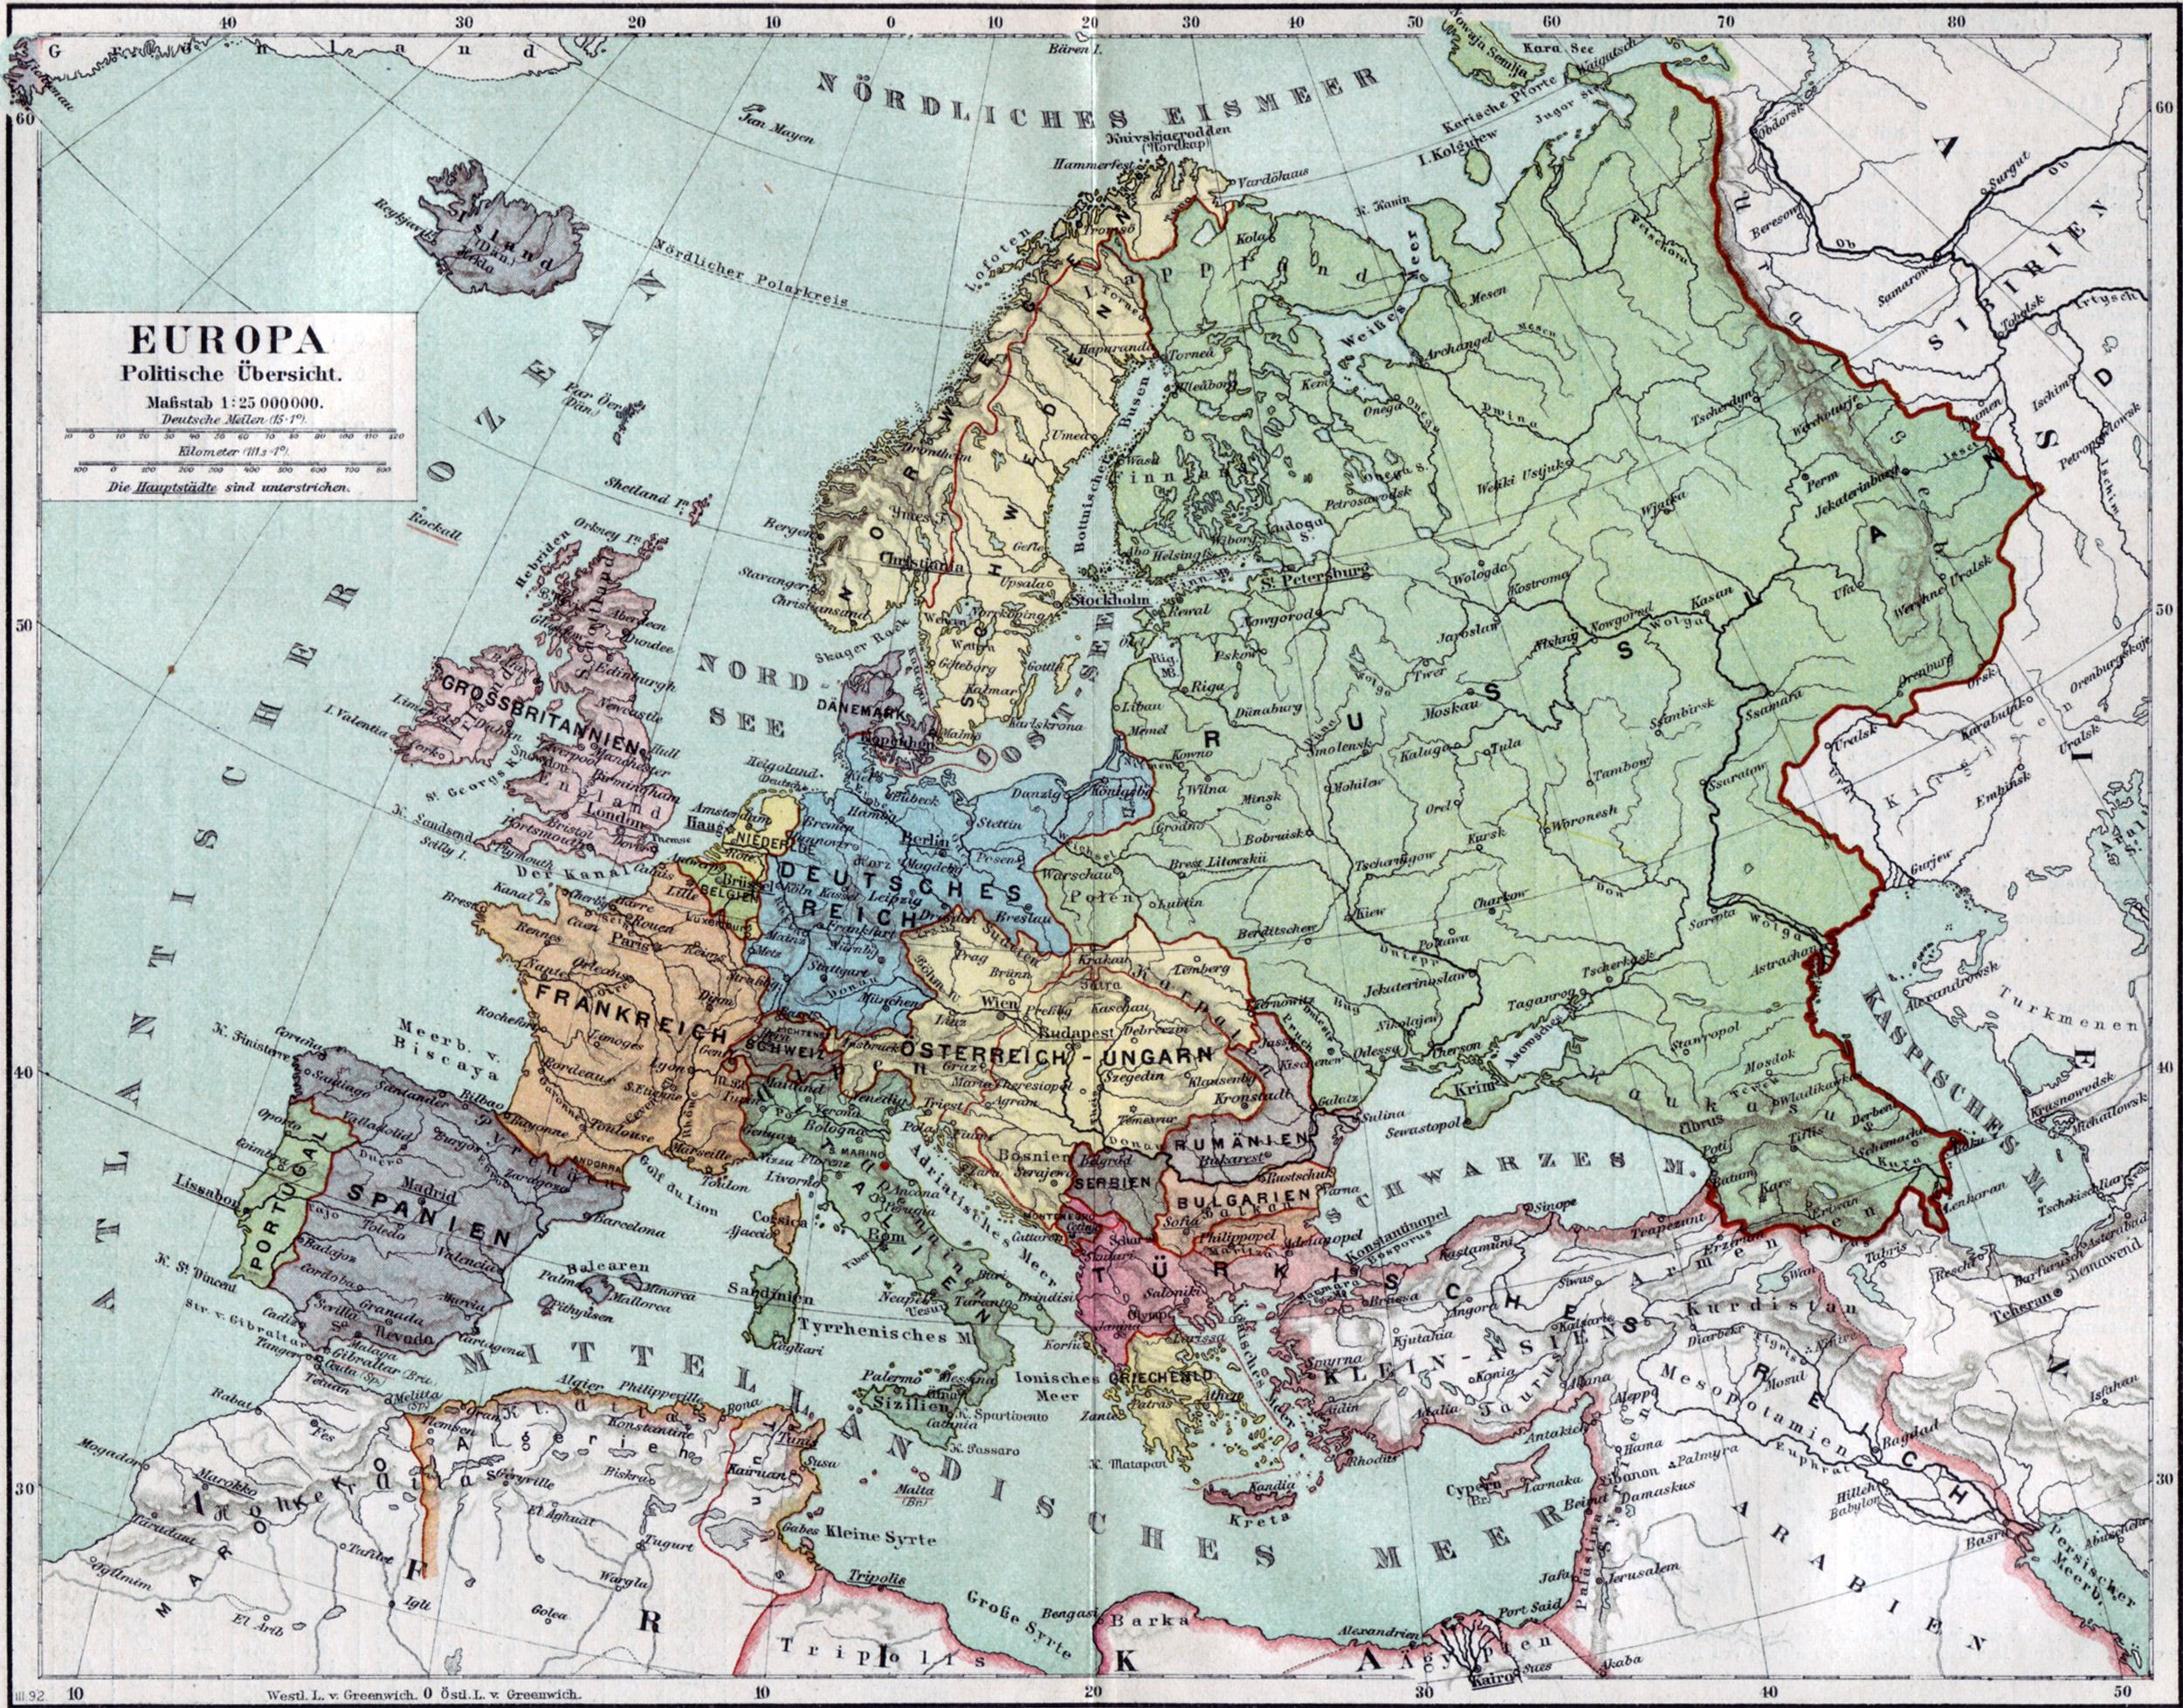 1890 World Map.File Europa 1890 Jpg Wikimedia Commons